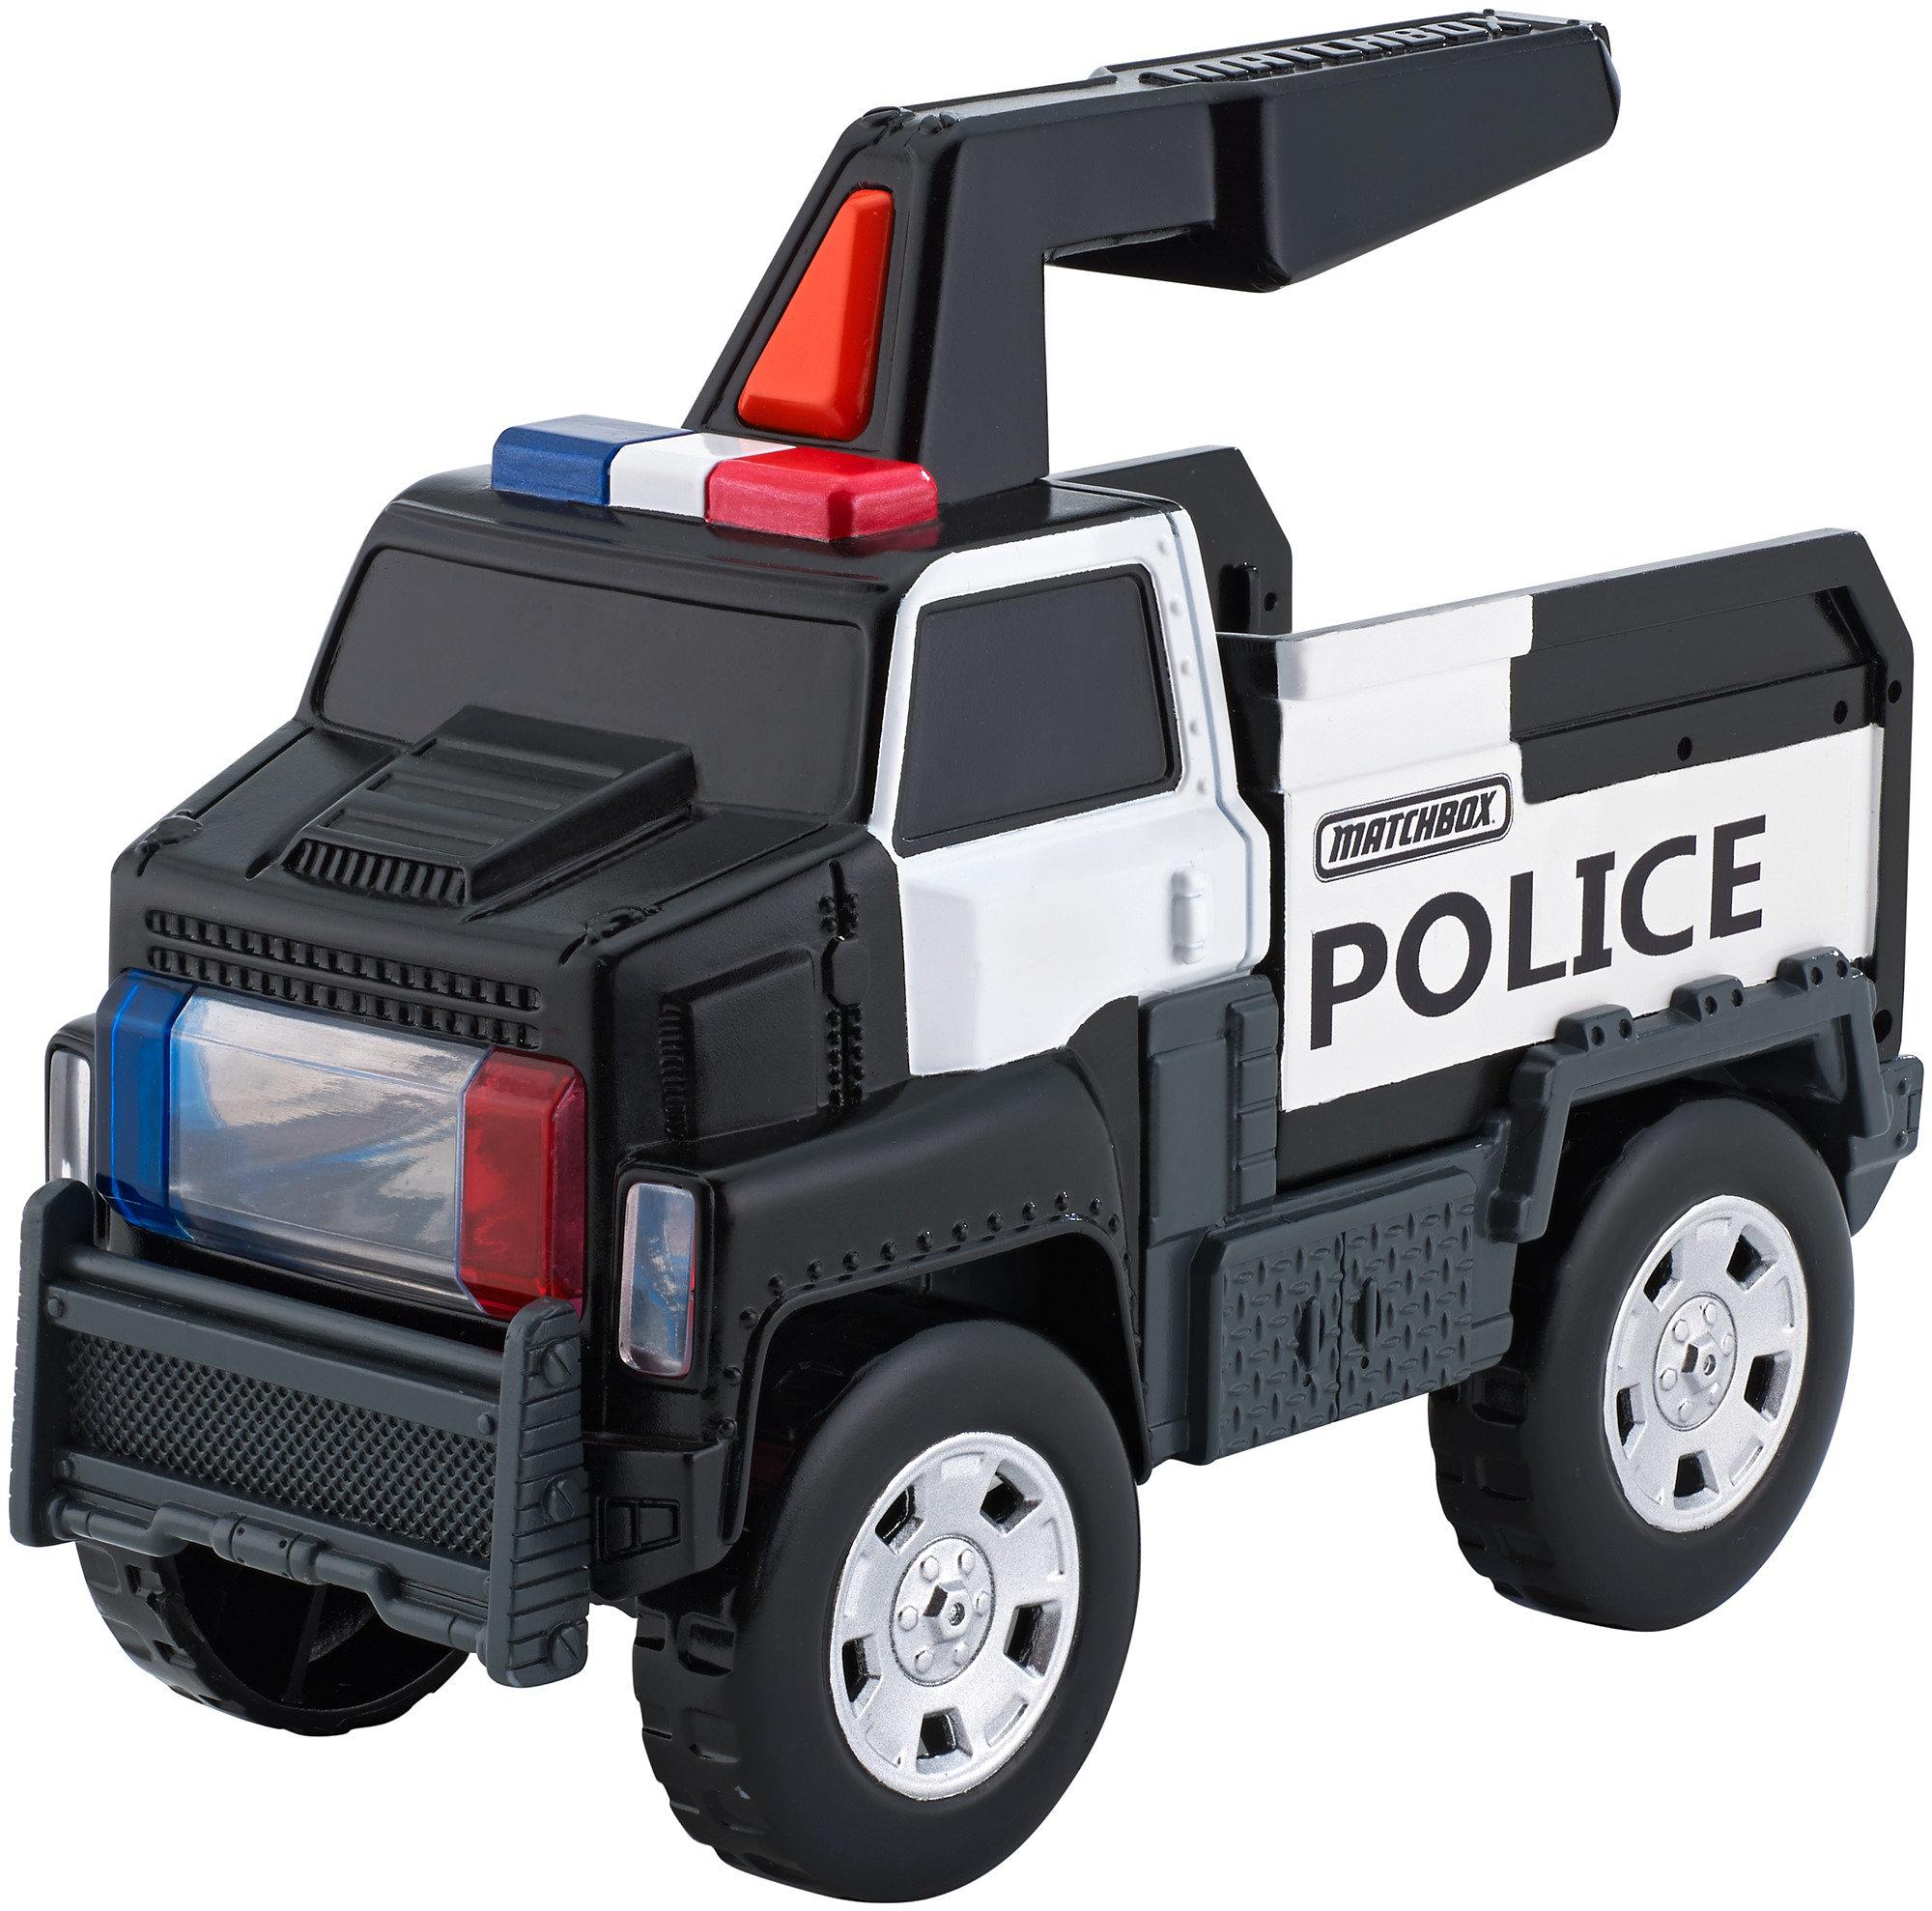 Matchbox Police Truck Flashlight